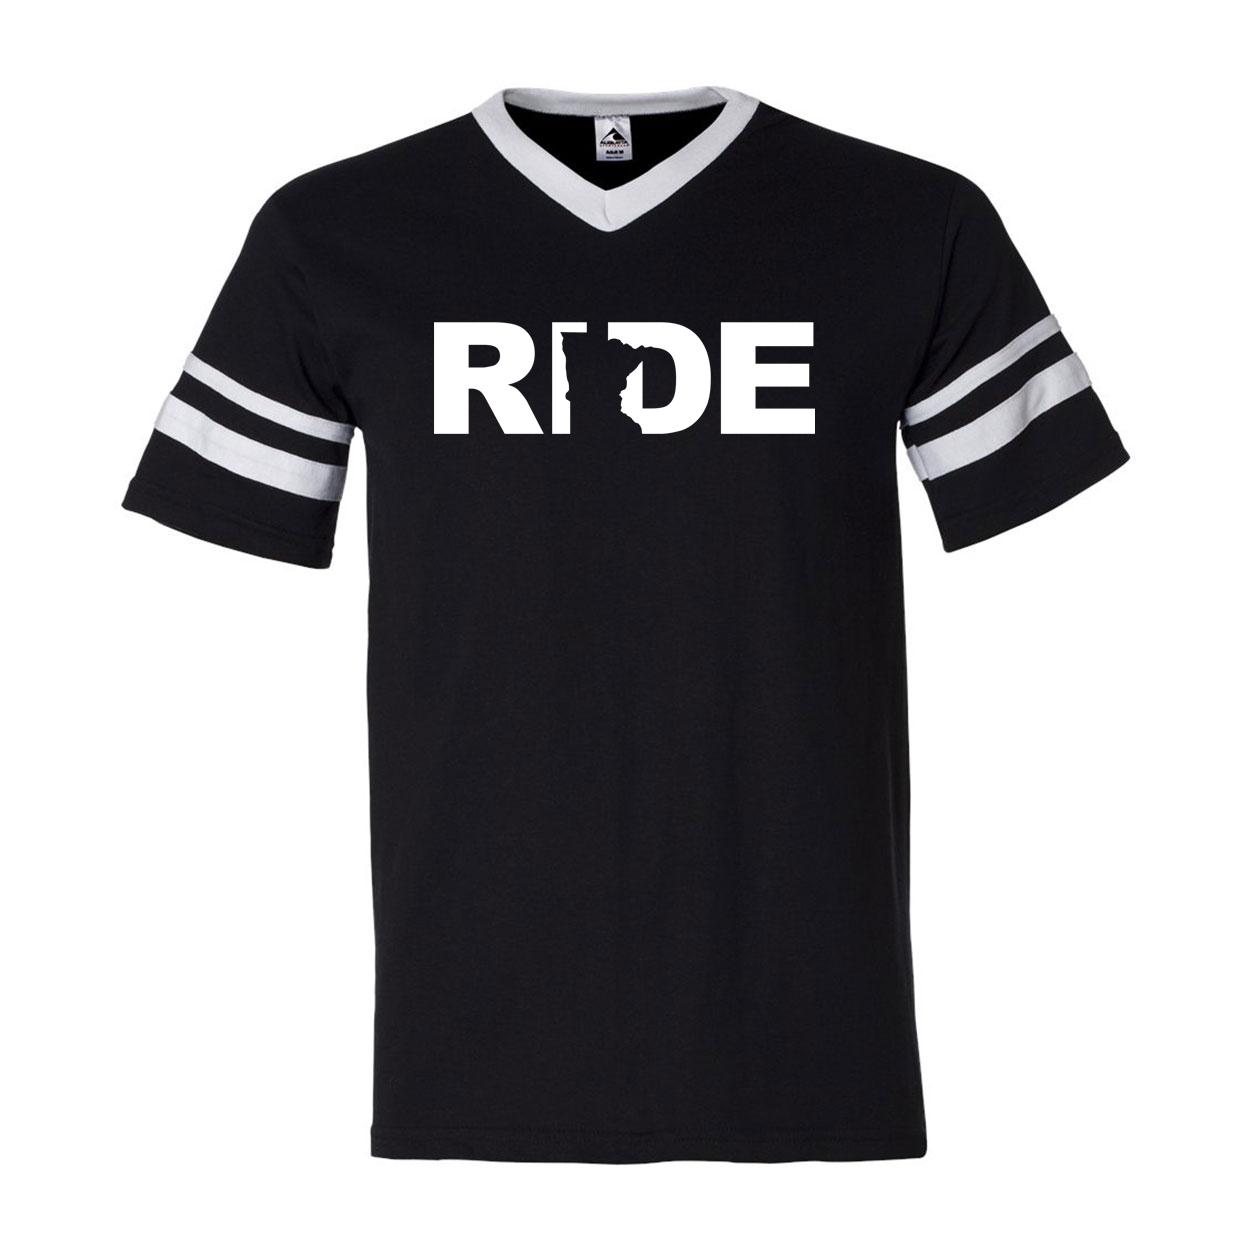 Ride Minnesota Classic Premium Striped Jersey T-Shirt Black/White (White Logo)